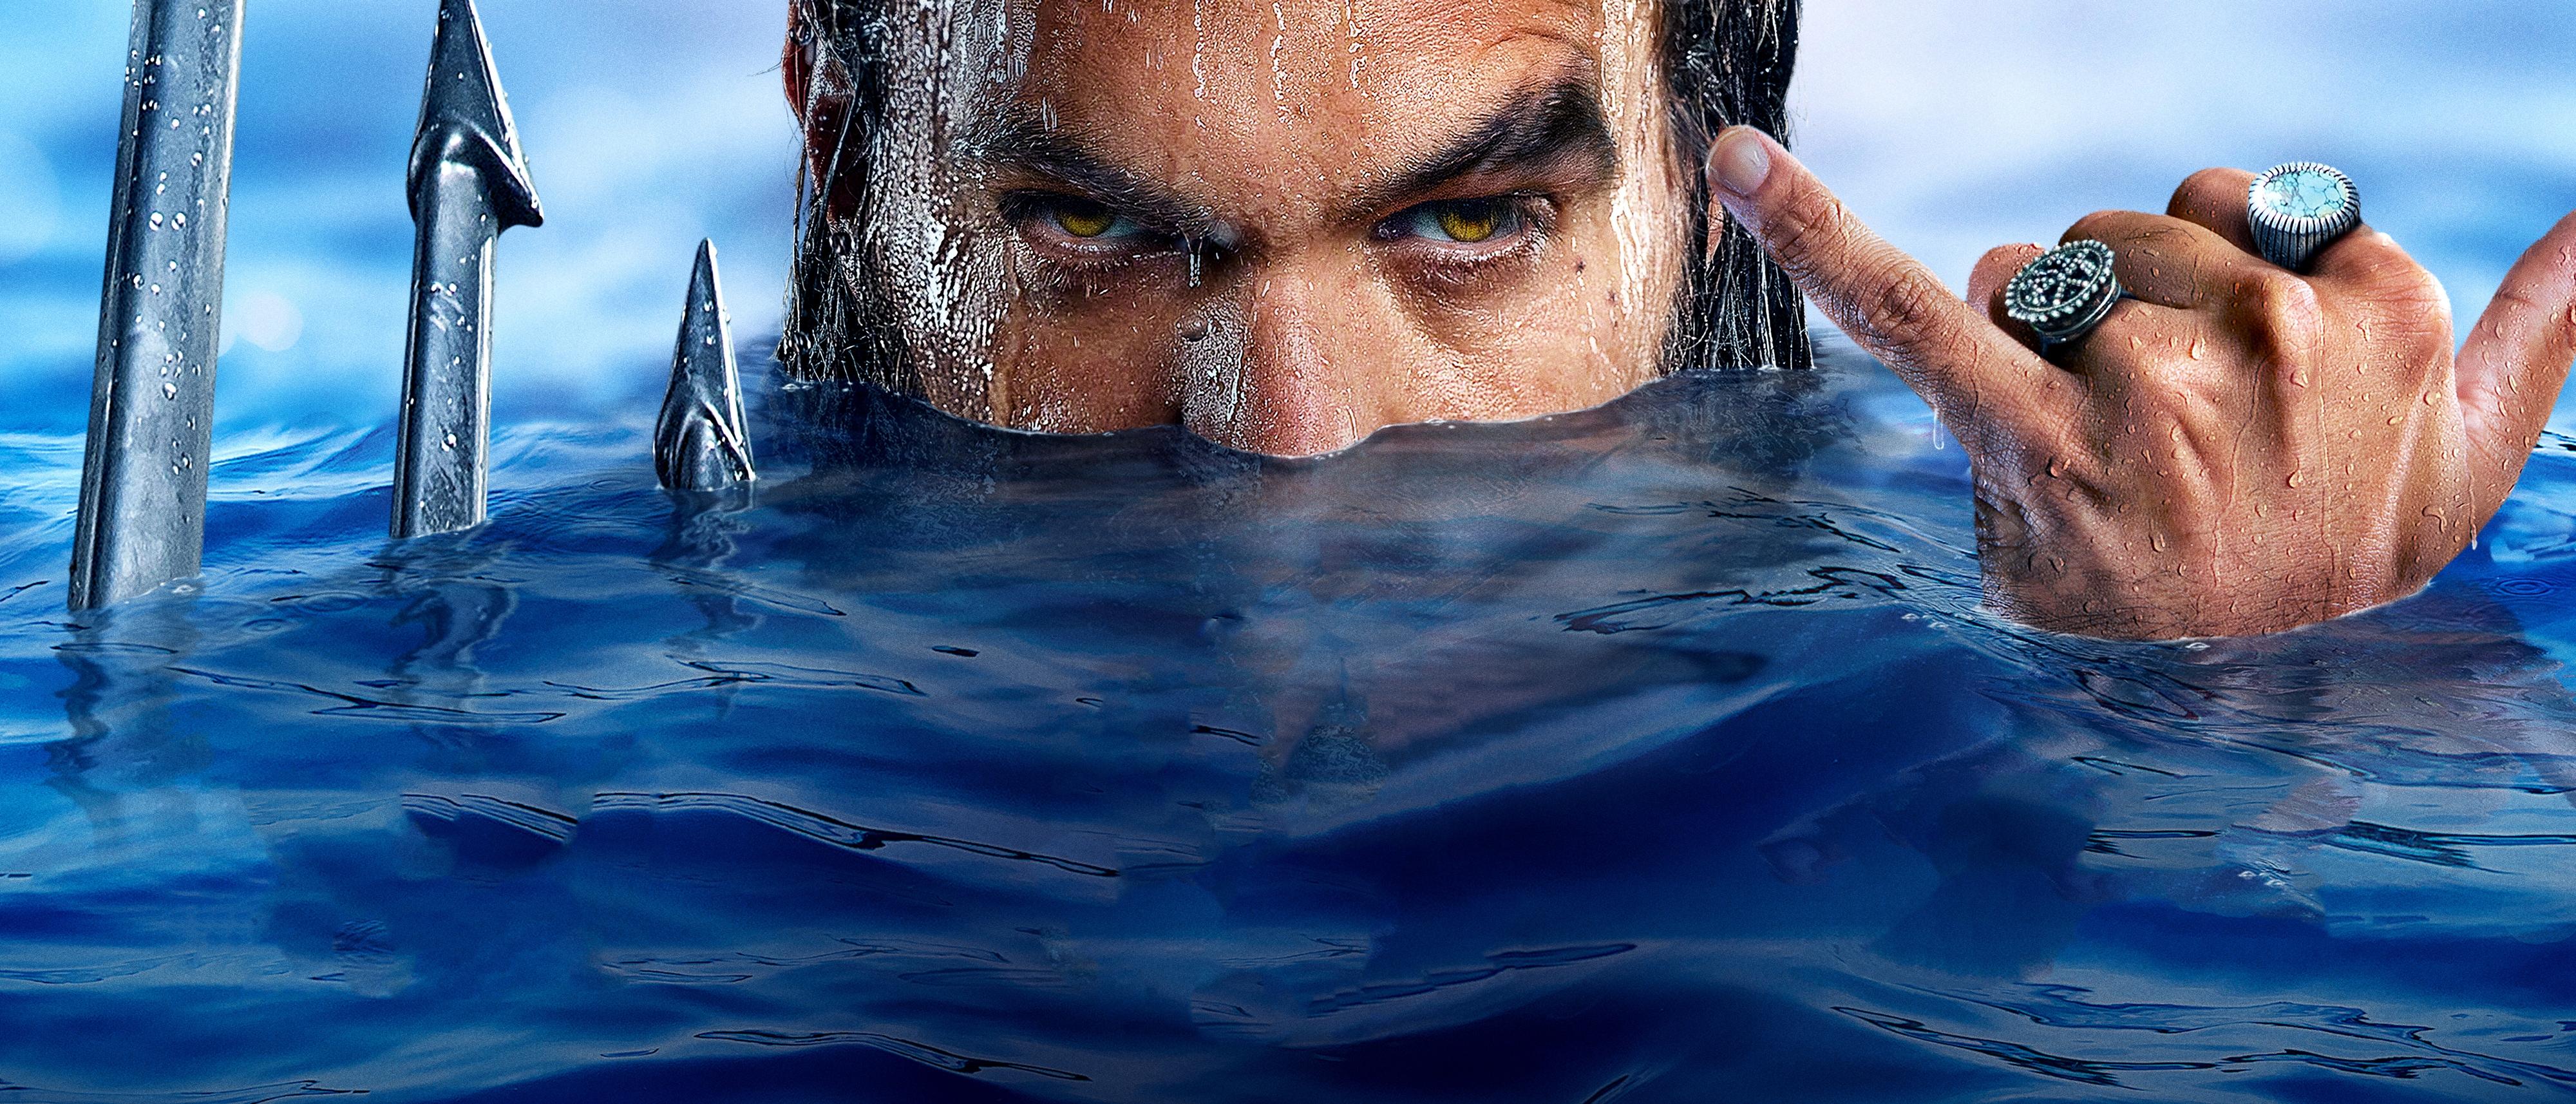 Avatar Land Aquaman-Aquaman-061